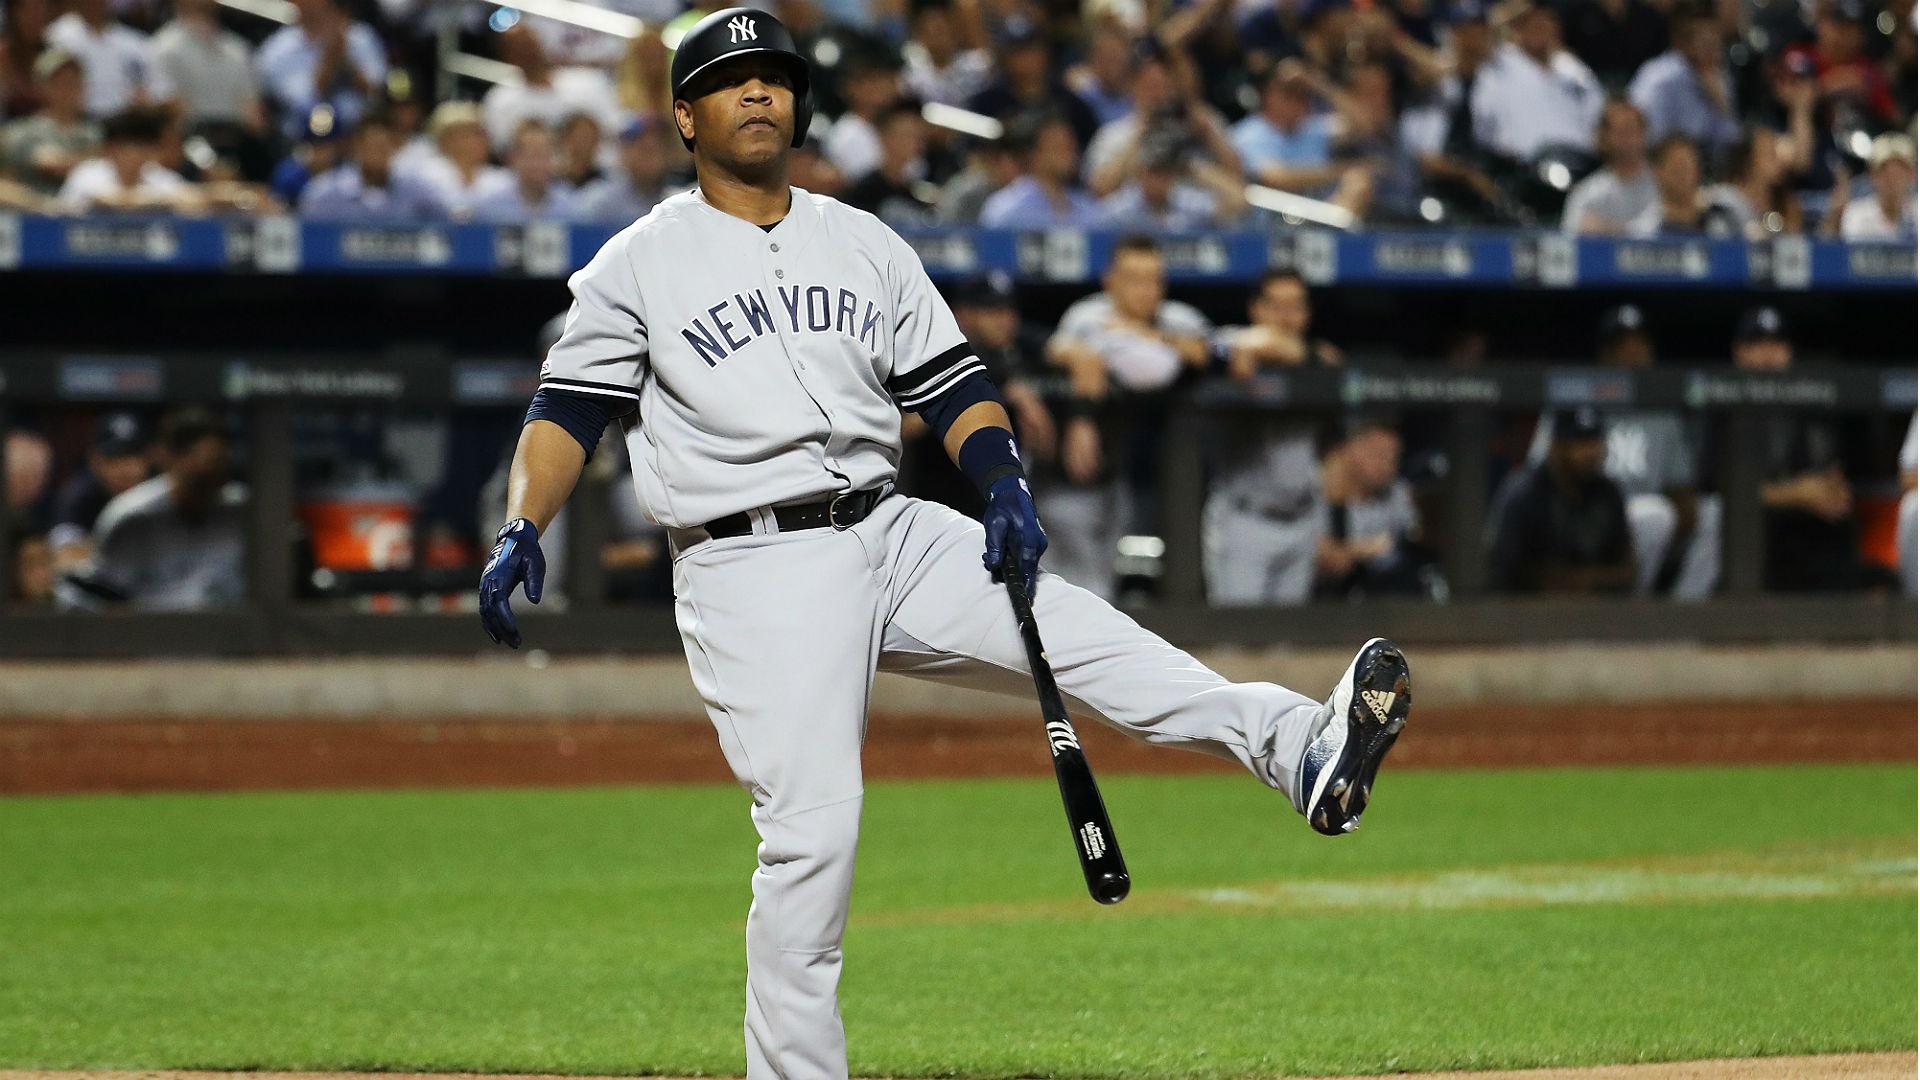 Yankees home-run streak snapped